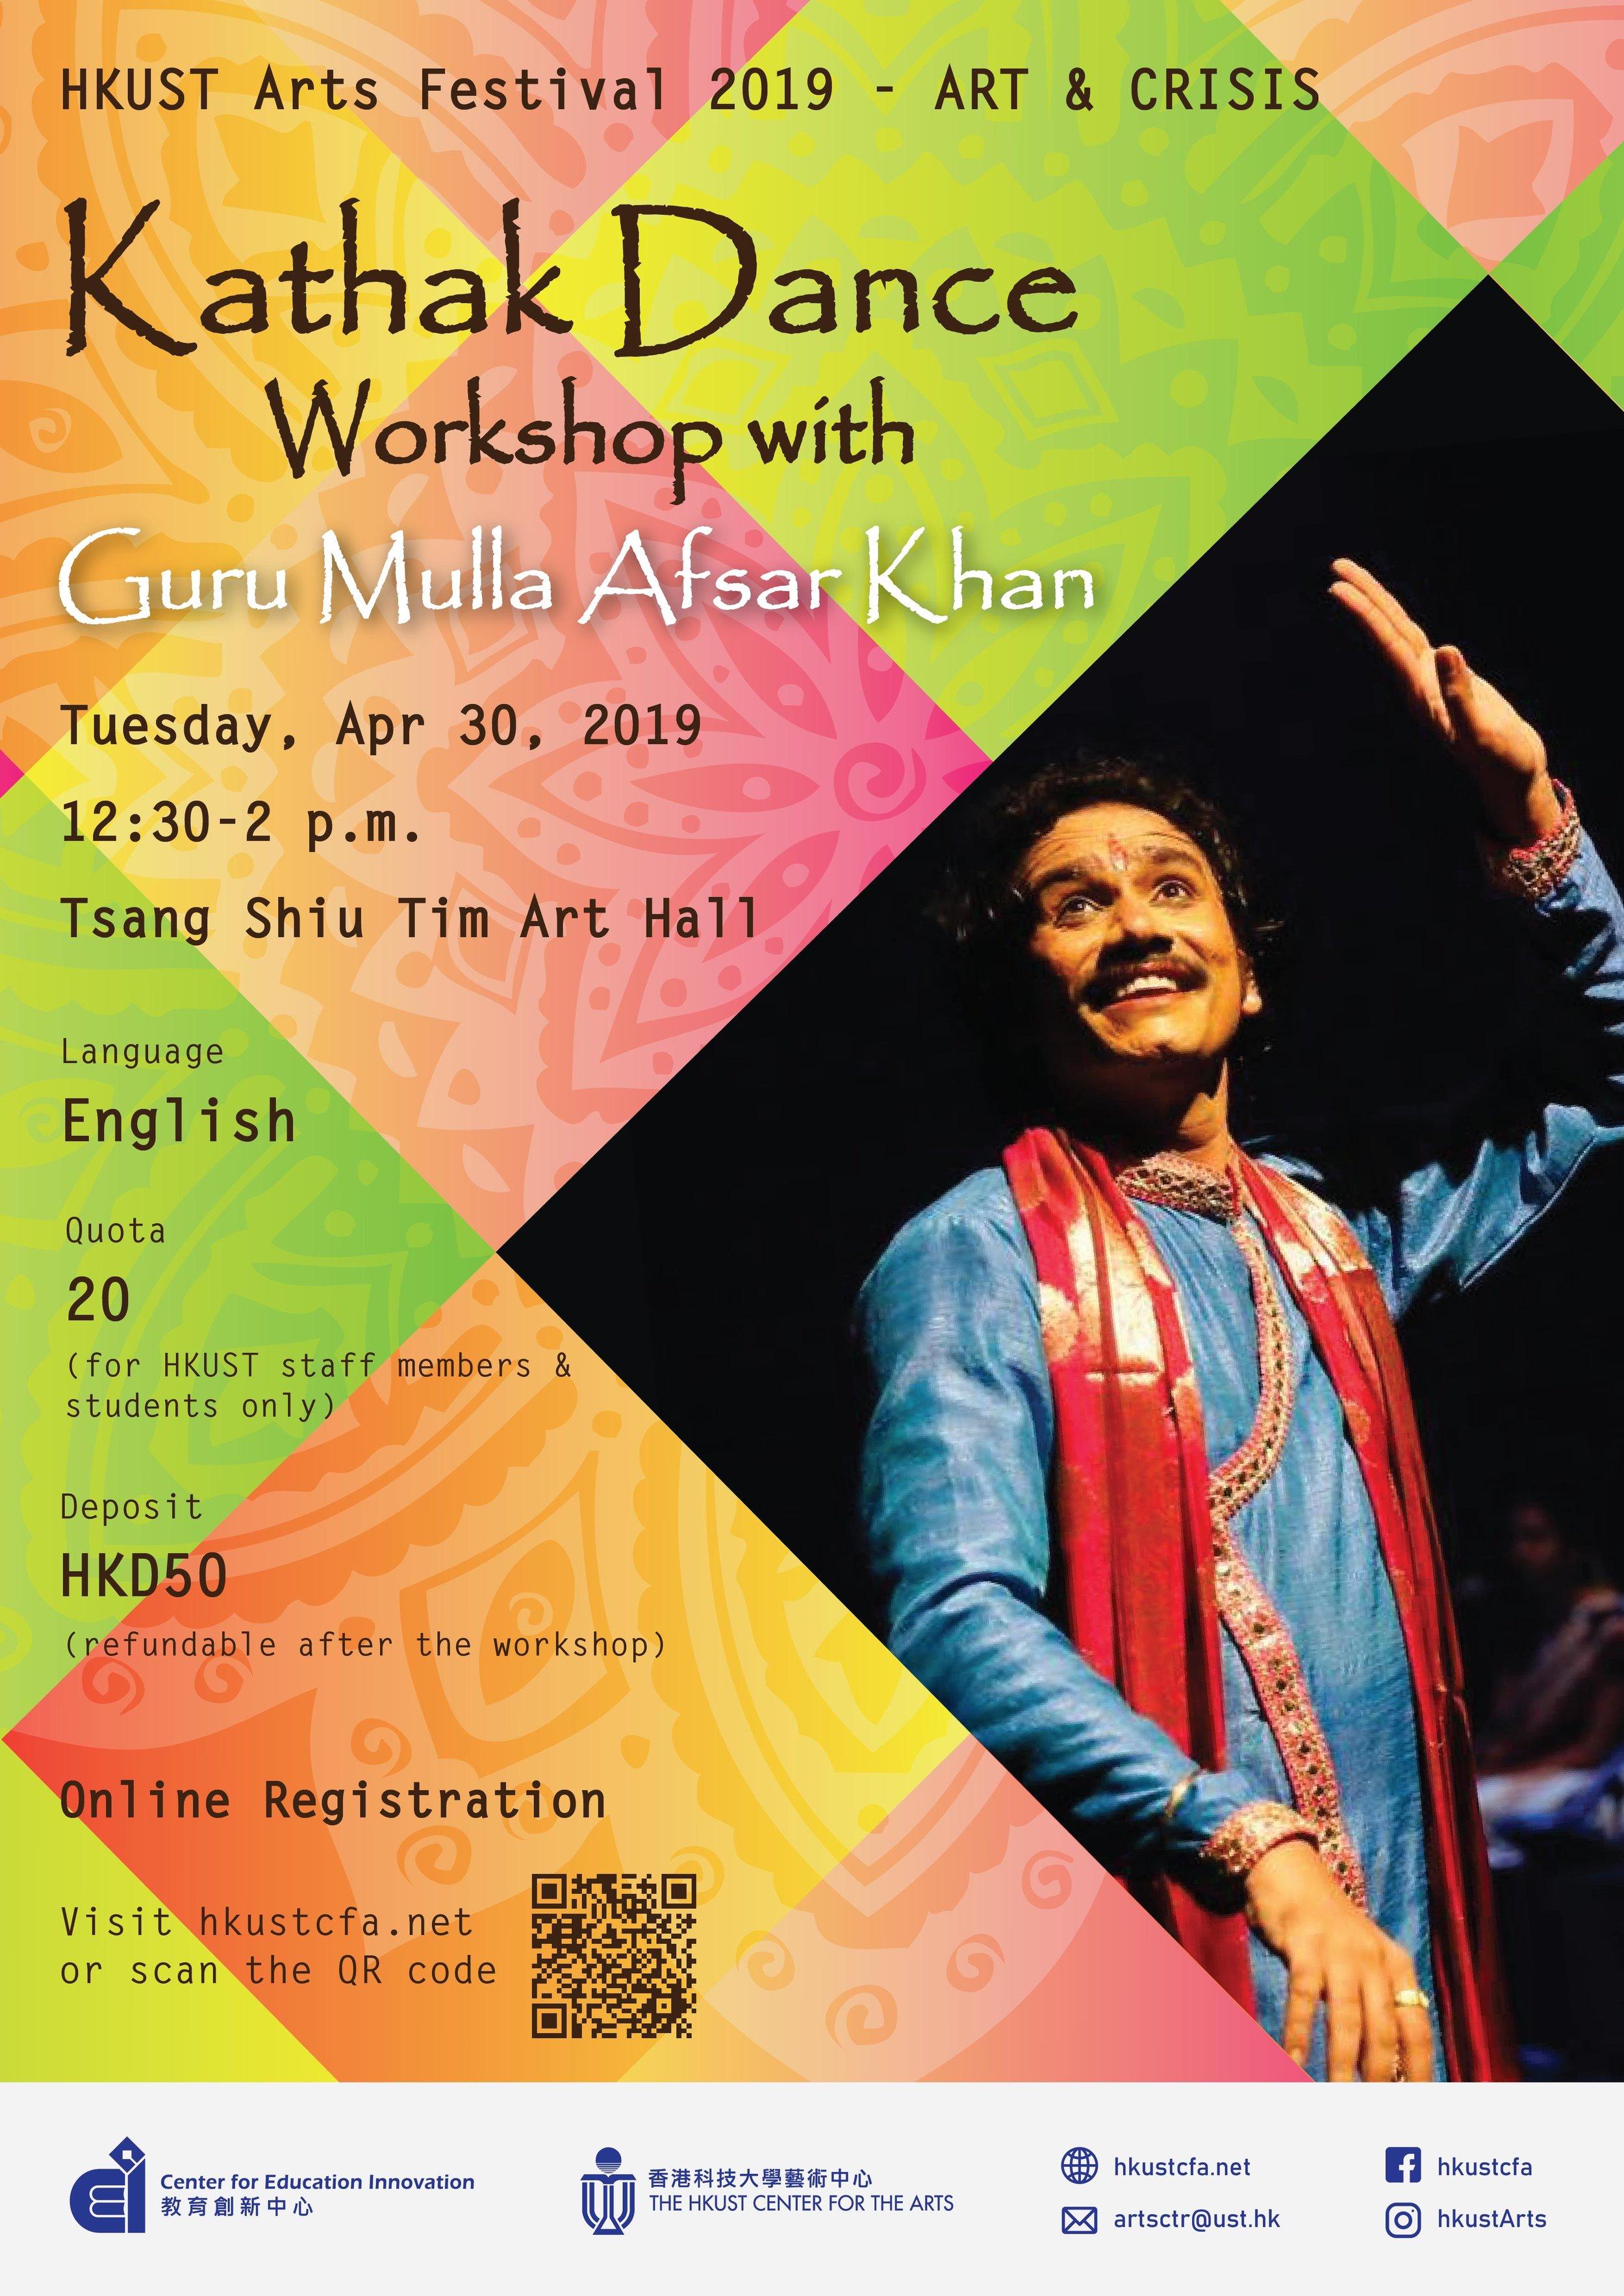 Poster_Kathak Dance Workshop with Guru Mulla Afsar Khan_20190430-01.jpg